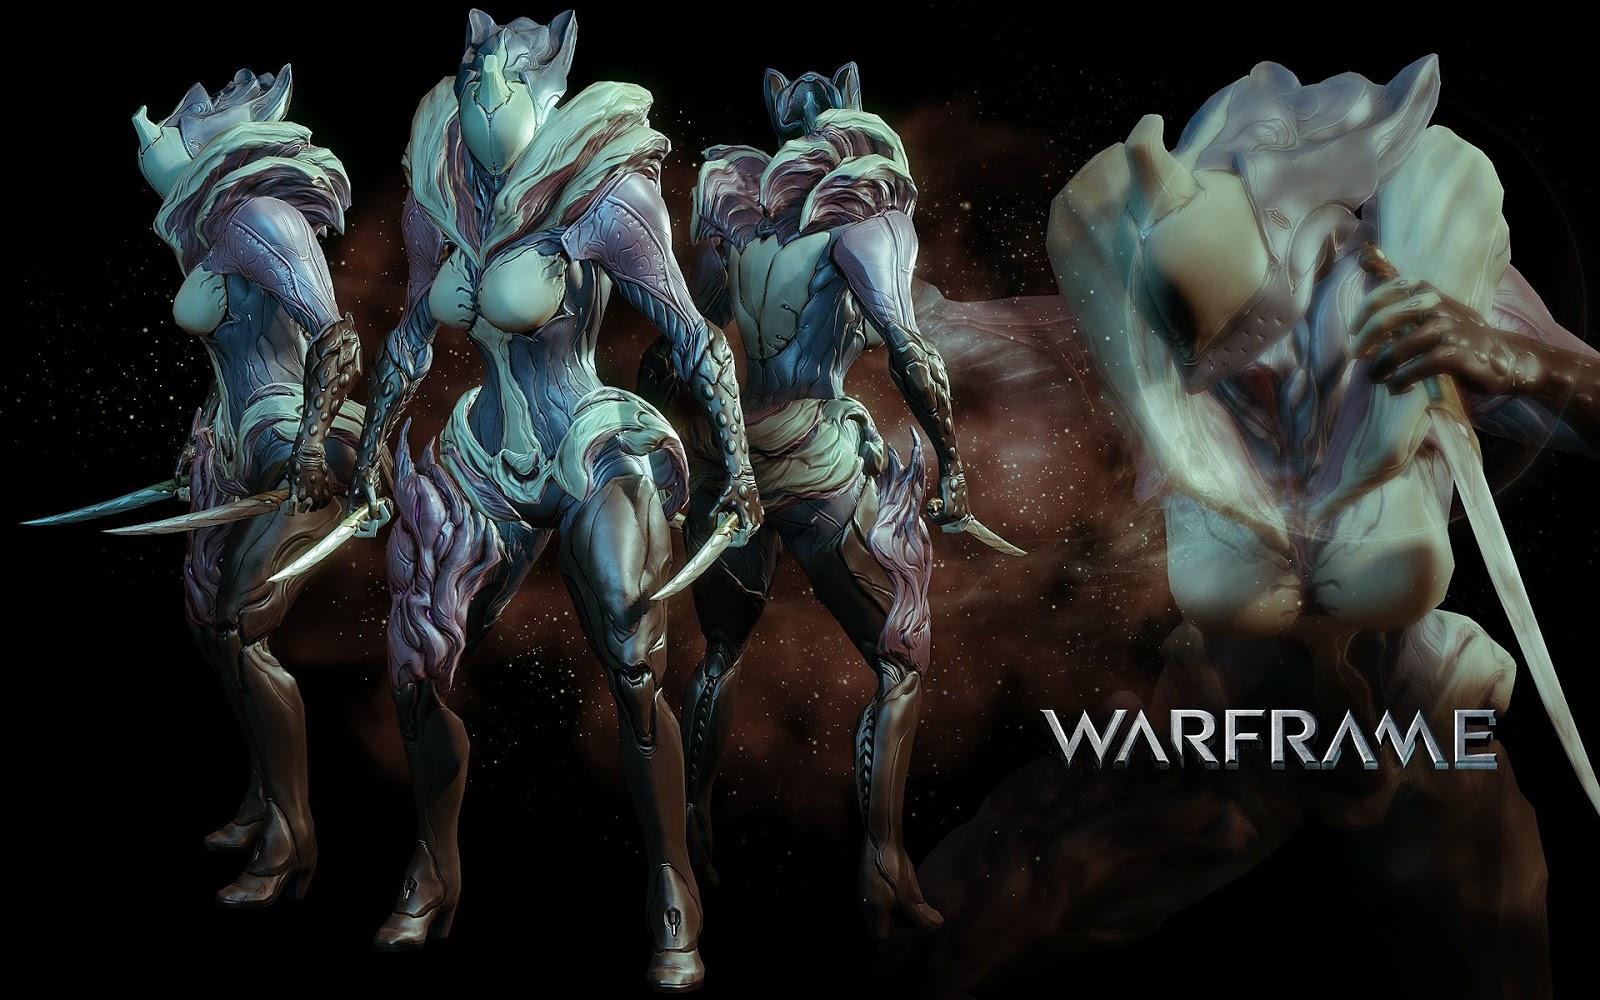 Warframe Wallpapers